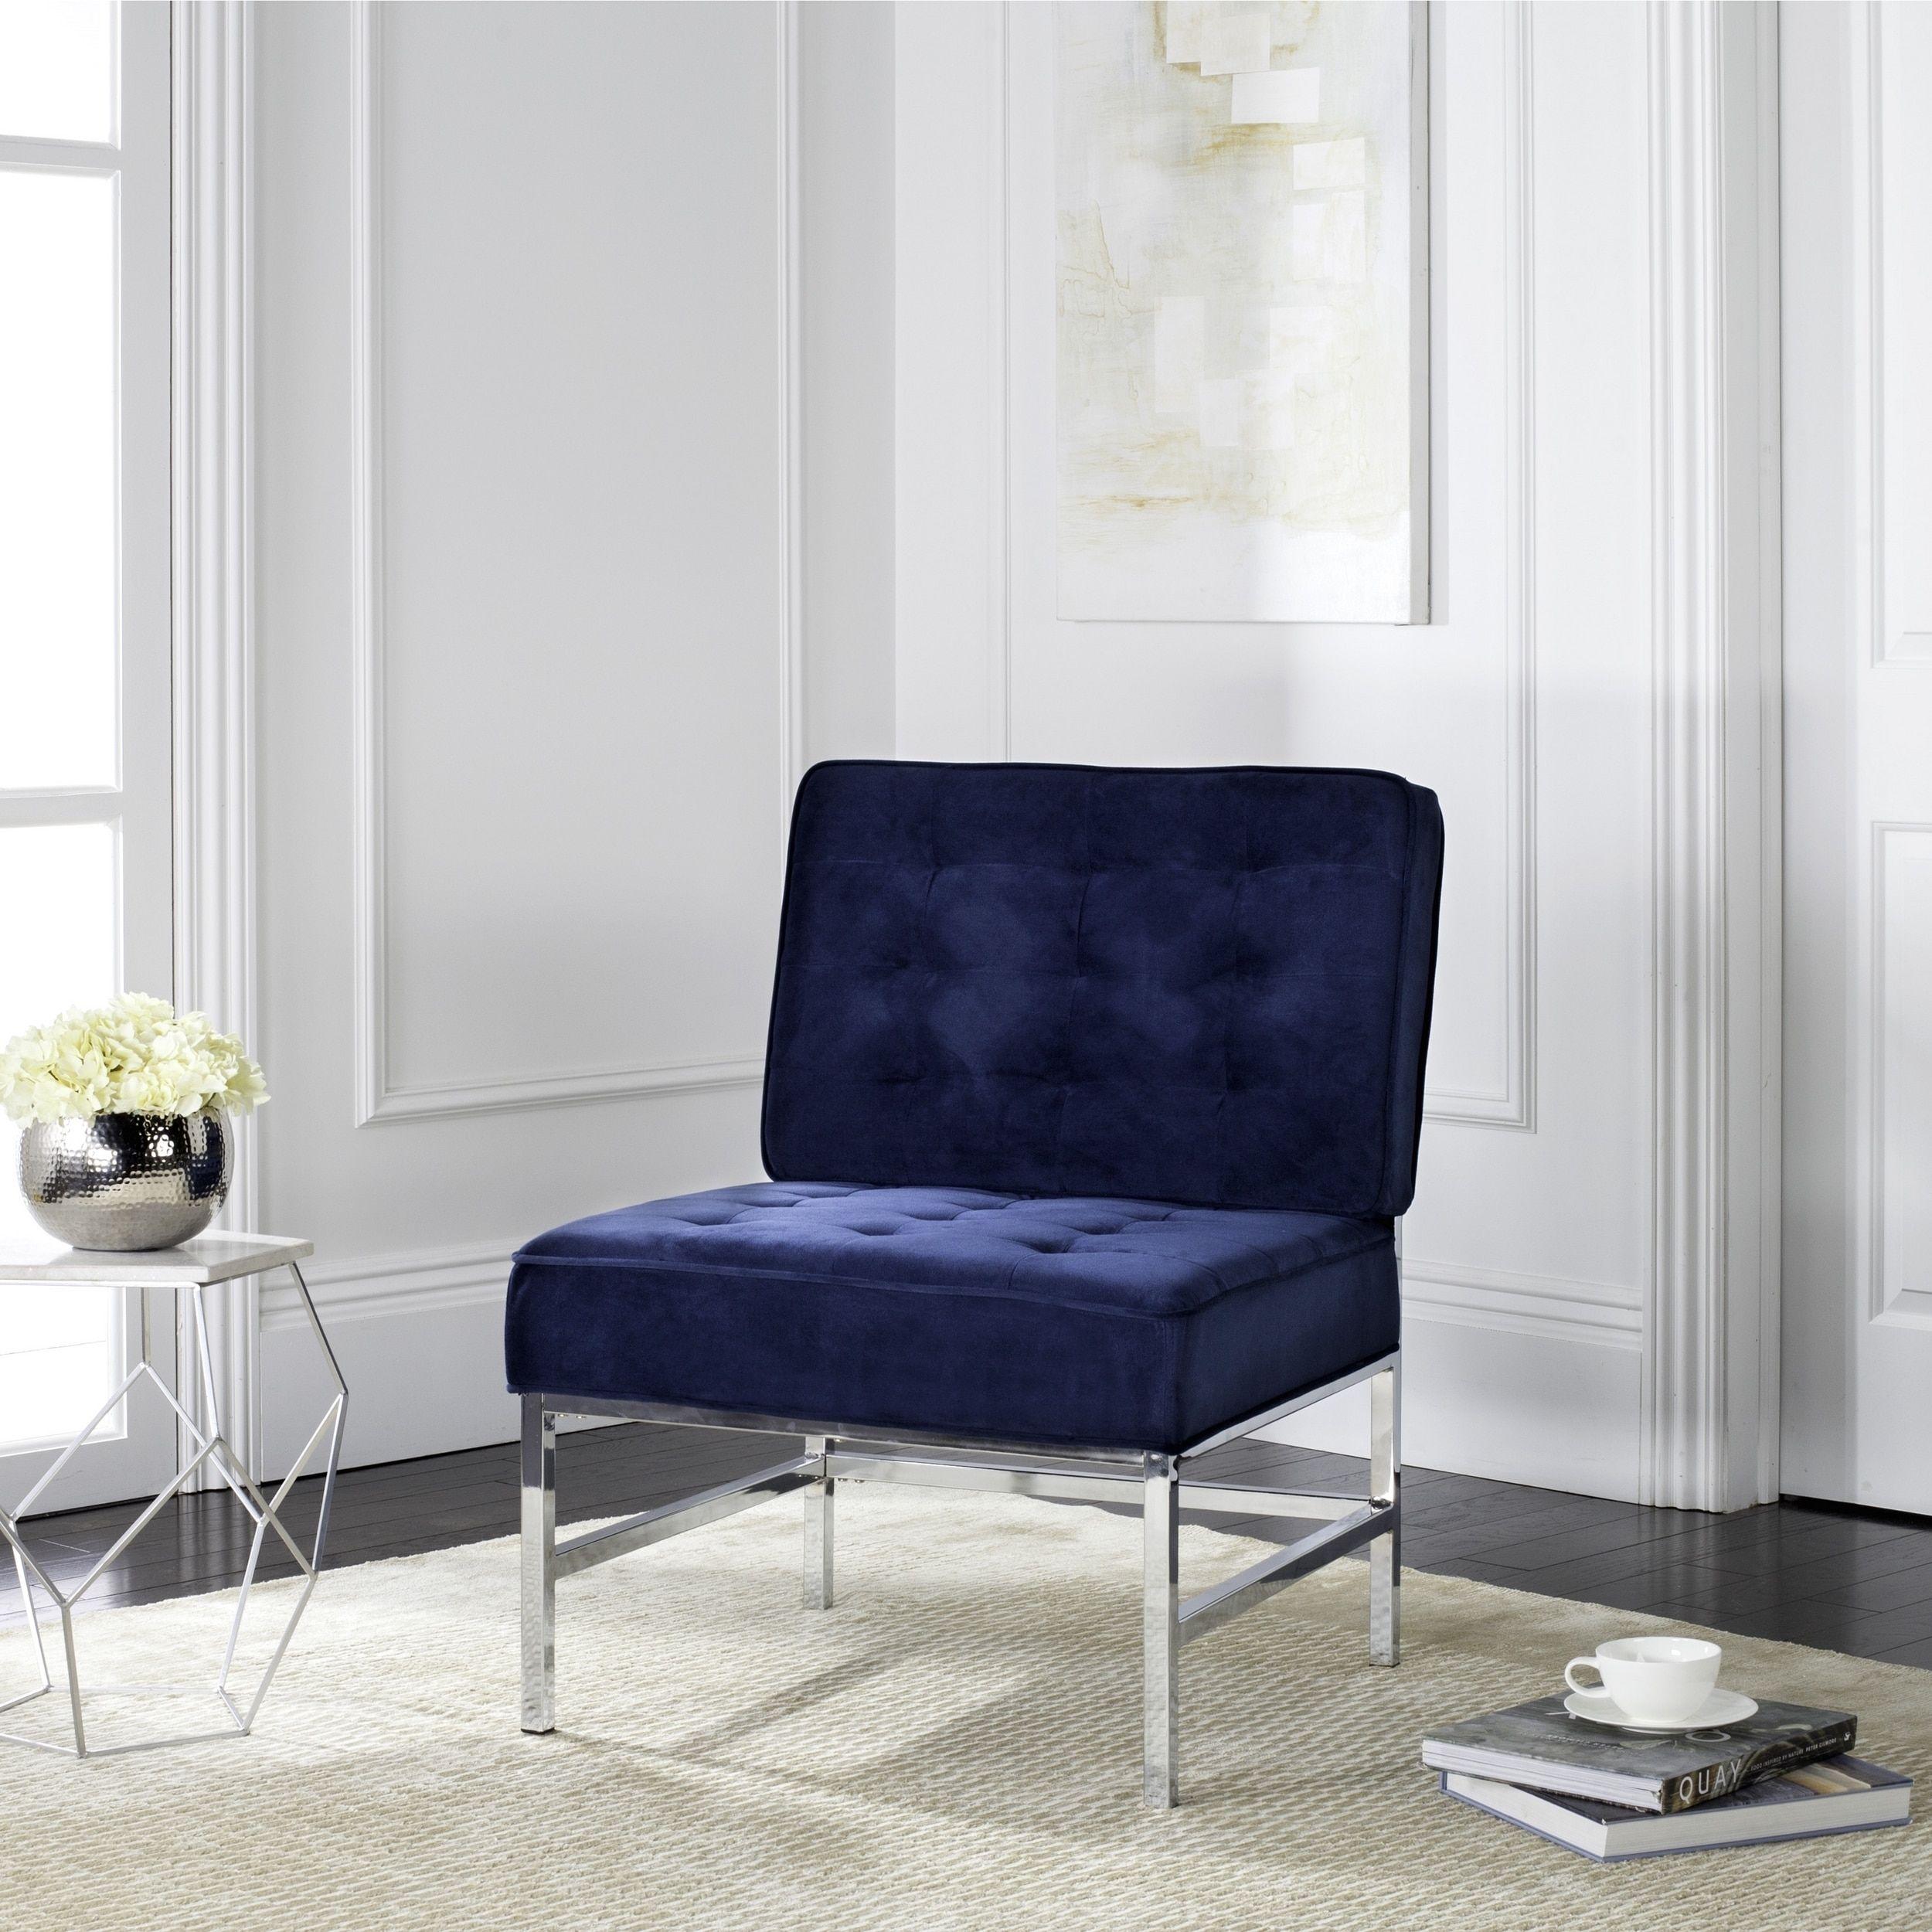 Accent chair modern - Safavieh Mid Century Modern Ansel Tufted Velvet Chrome Navy Accent Chair